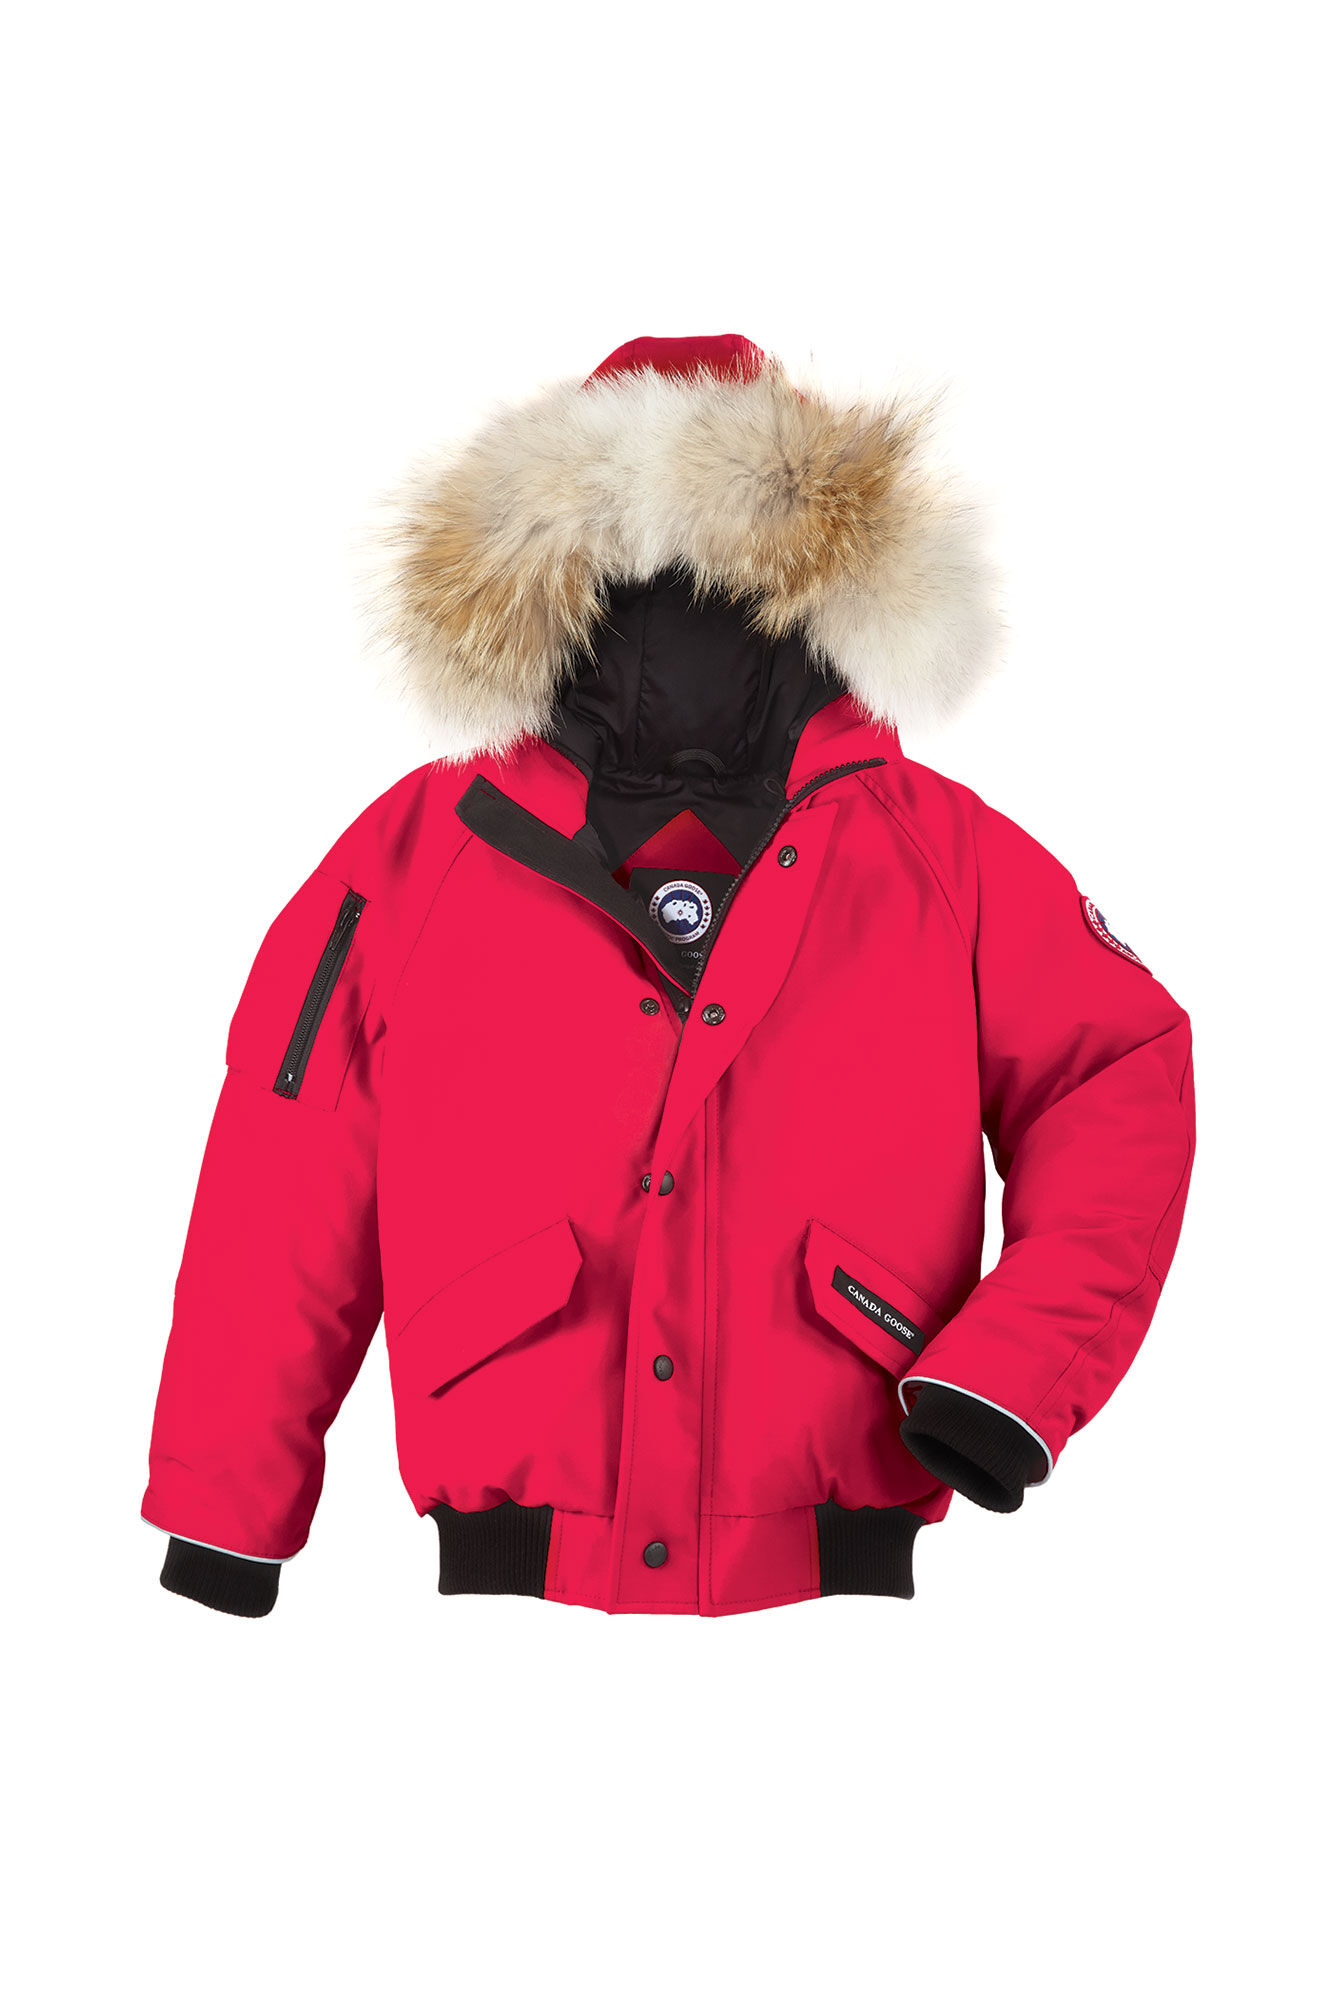 canada goose online retailers